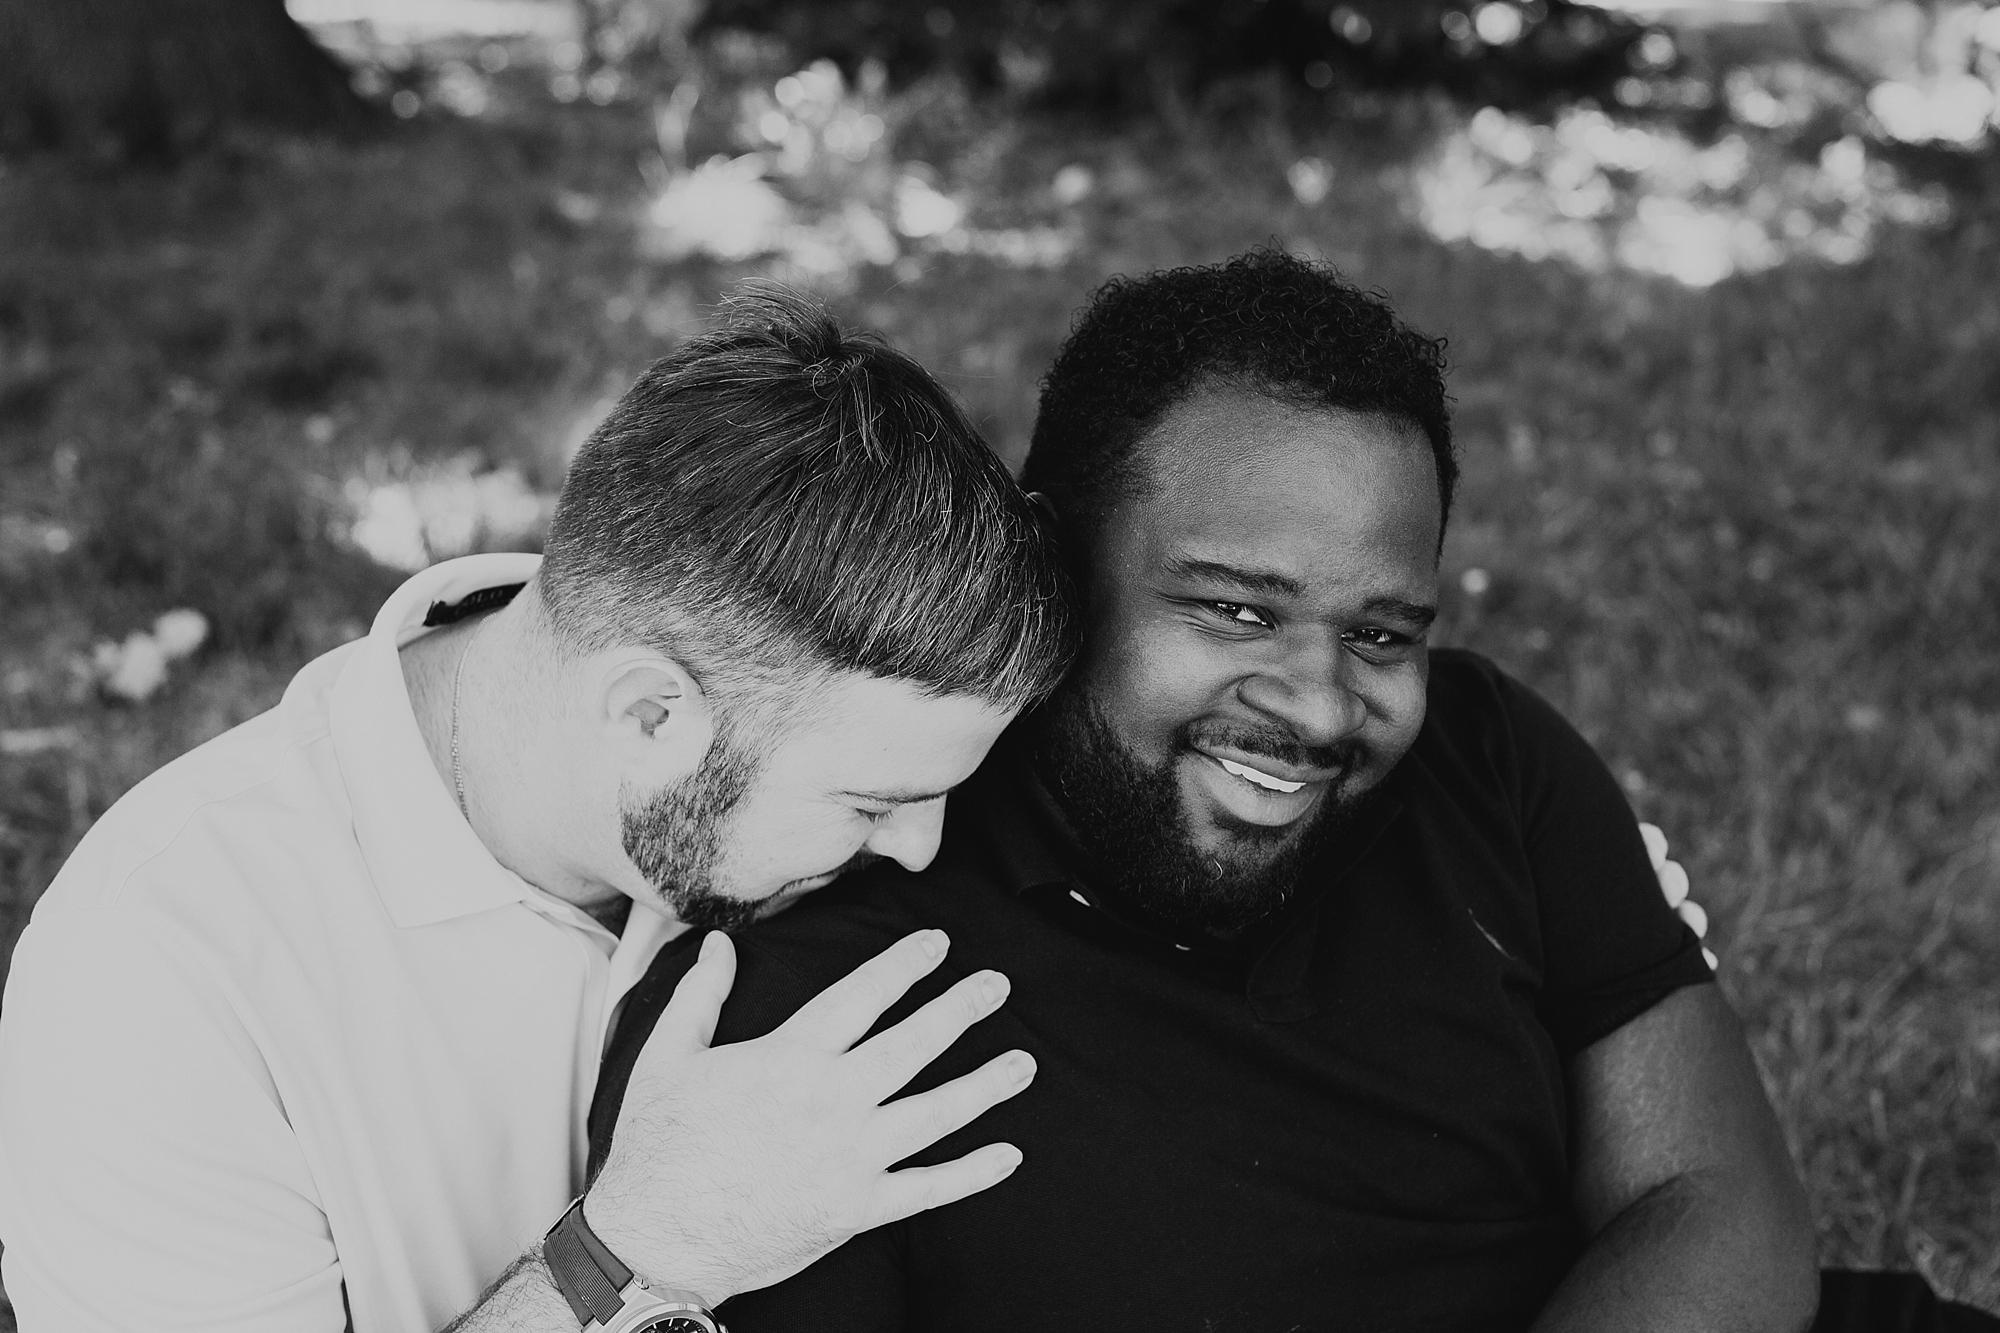 Joe_Mac_Creative_Philadelphia_Philly_LGBT_Gay_Engagement_Wedding_Photography__0006.jpg